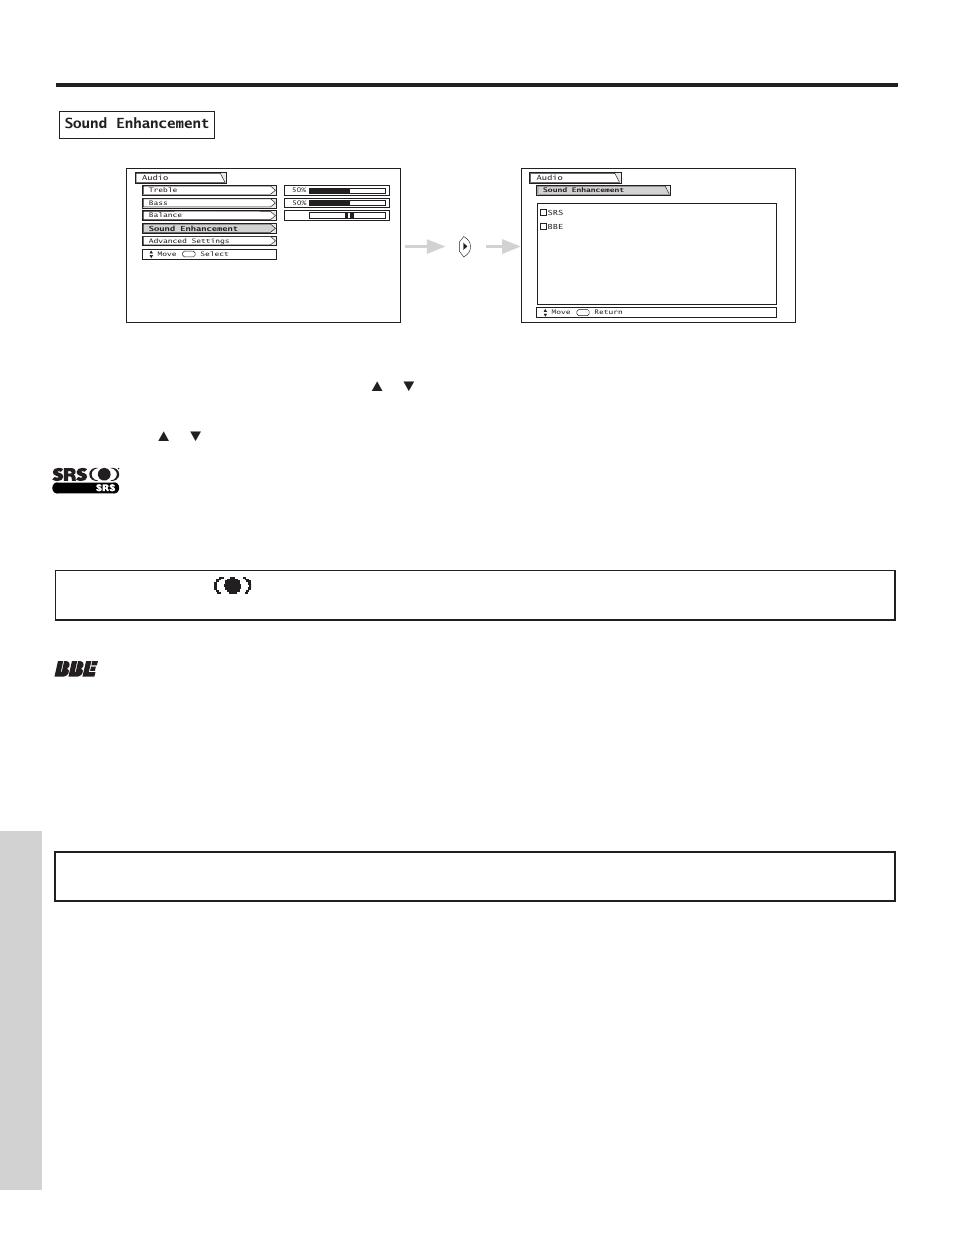 audio on screen displa y hitachi 51f500 user manual page 40 64 rh manualsdir com Hitachi StarBoard Manual Hitachi TV Repair Manual